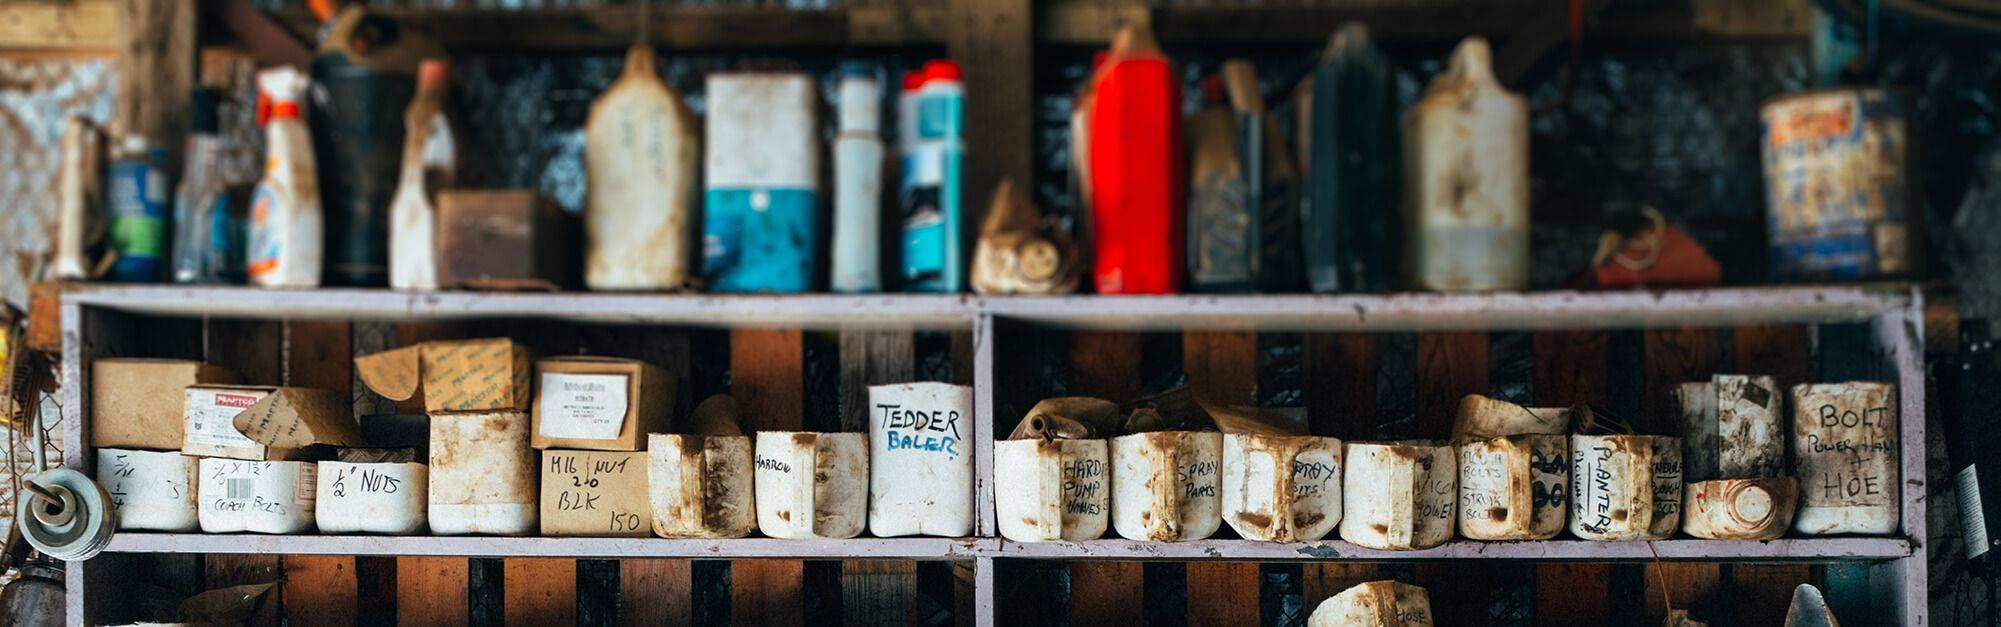 9.2 billion pounds of Welsh property value wasted storing junk